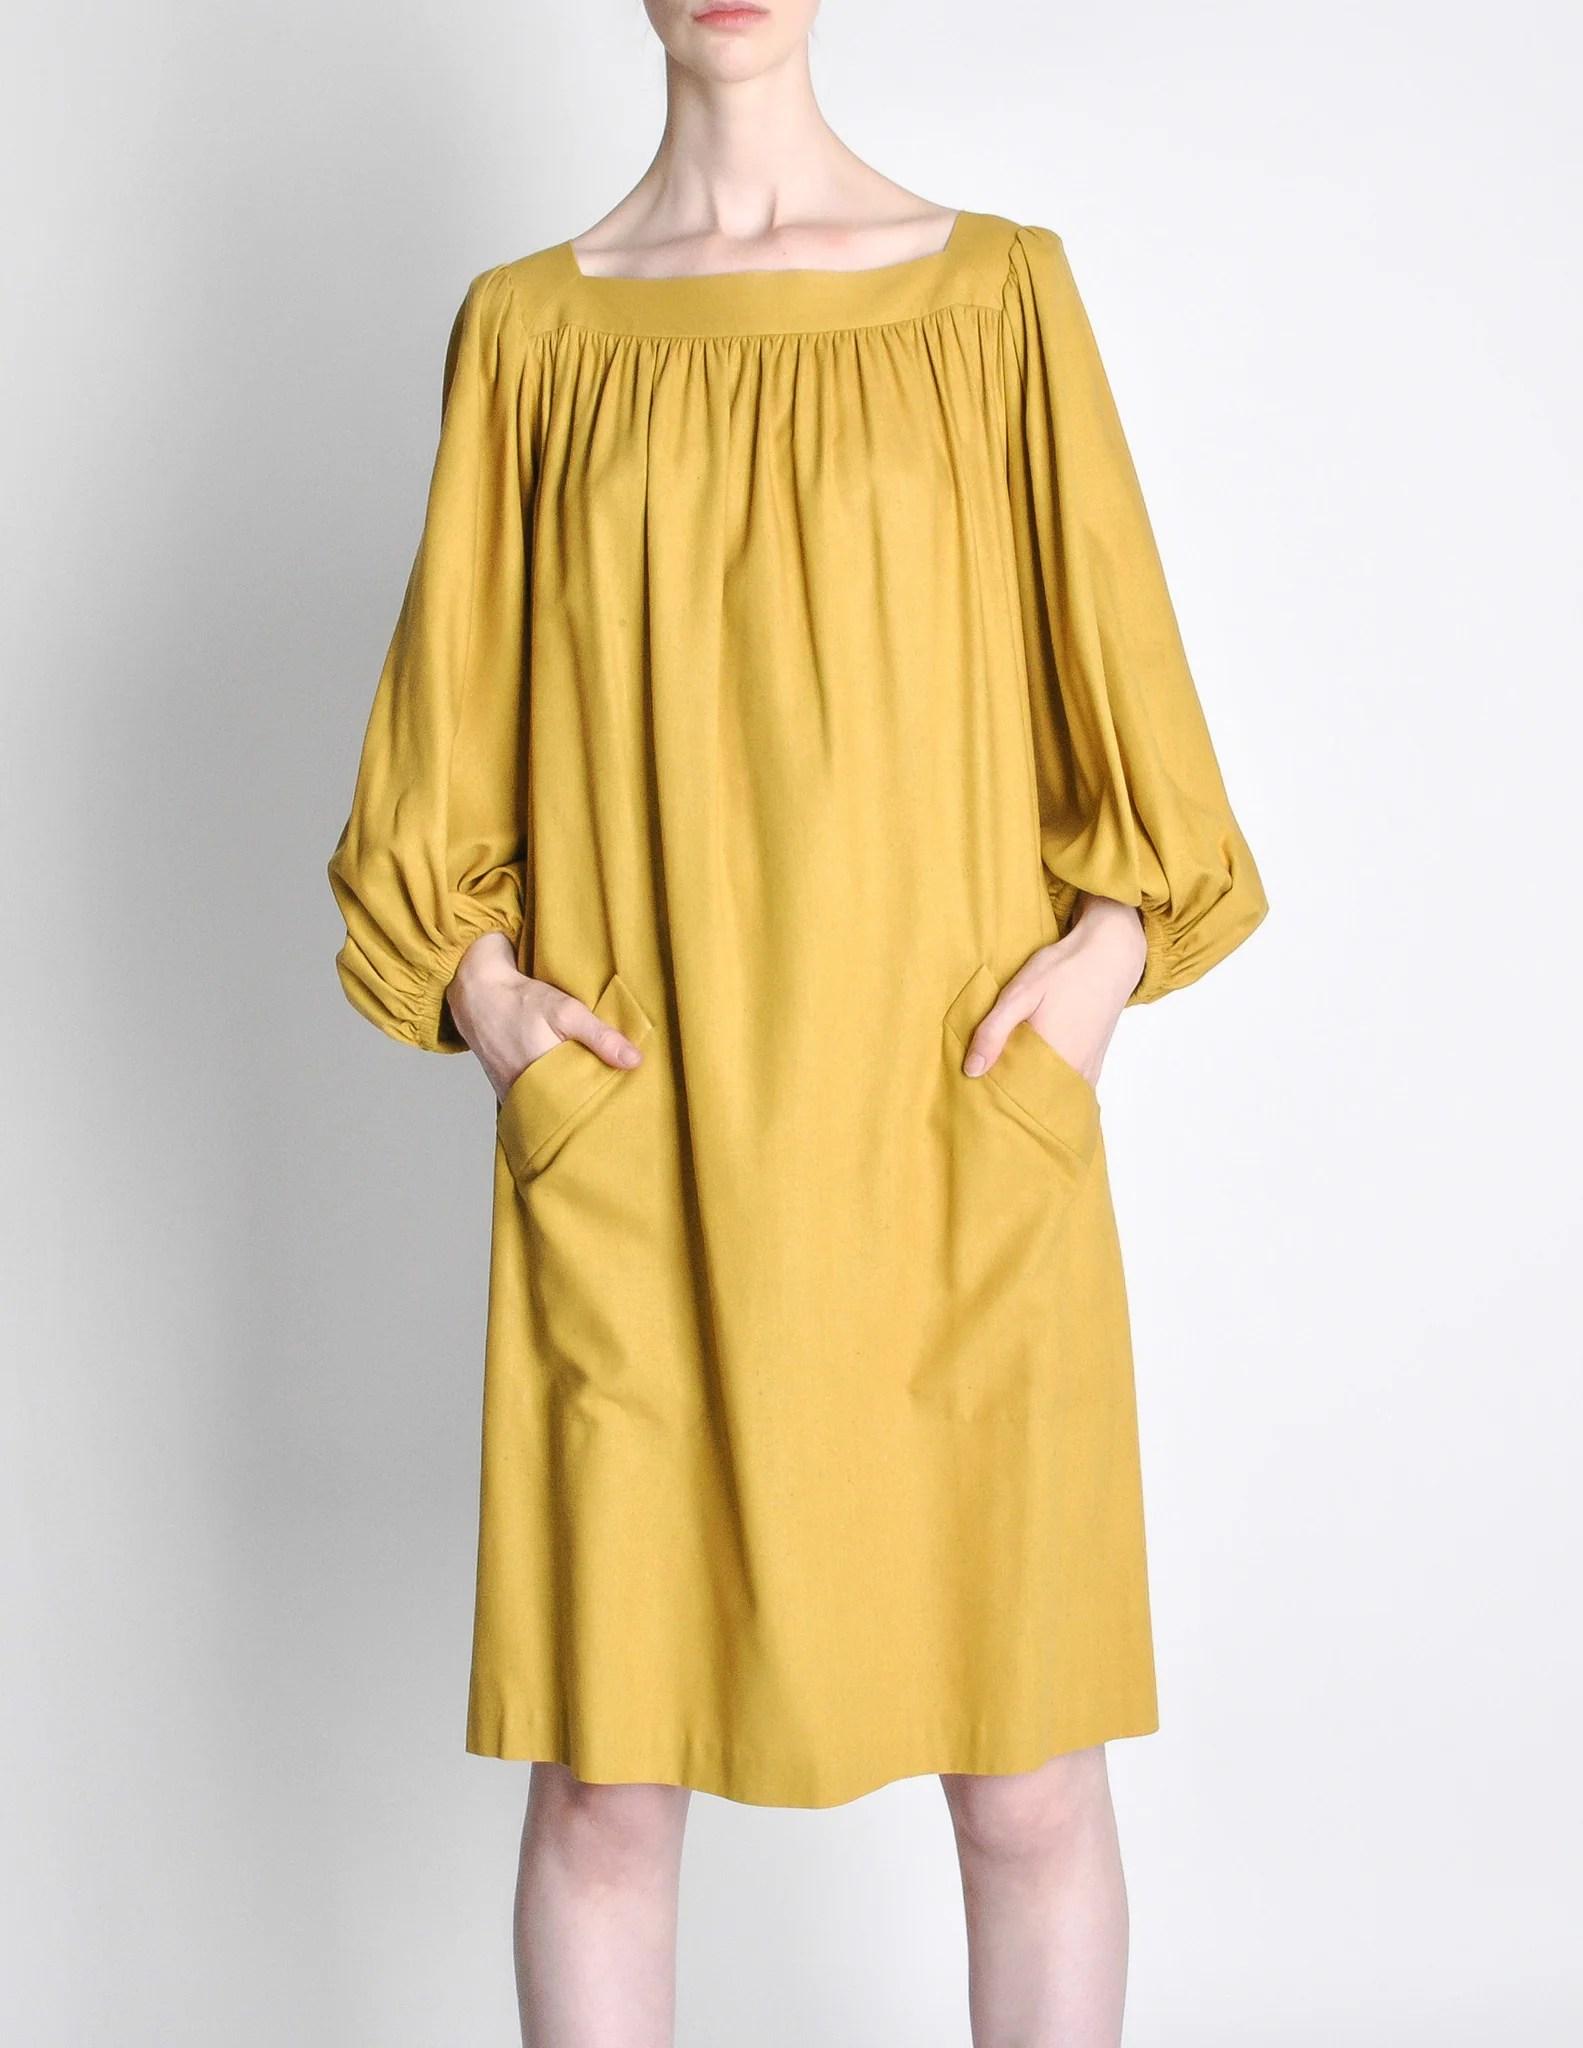 Yves Saint Laurent Rive Gauche Vintage Mustard Yellow Silk